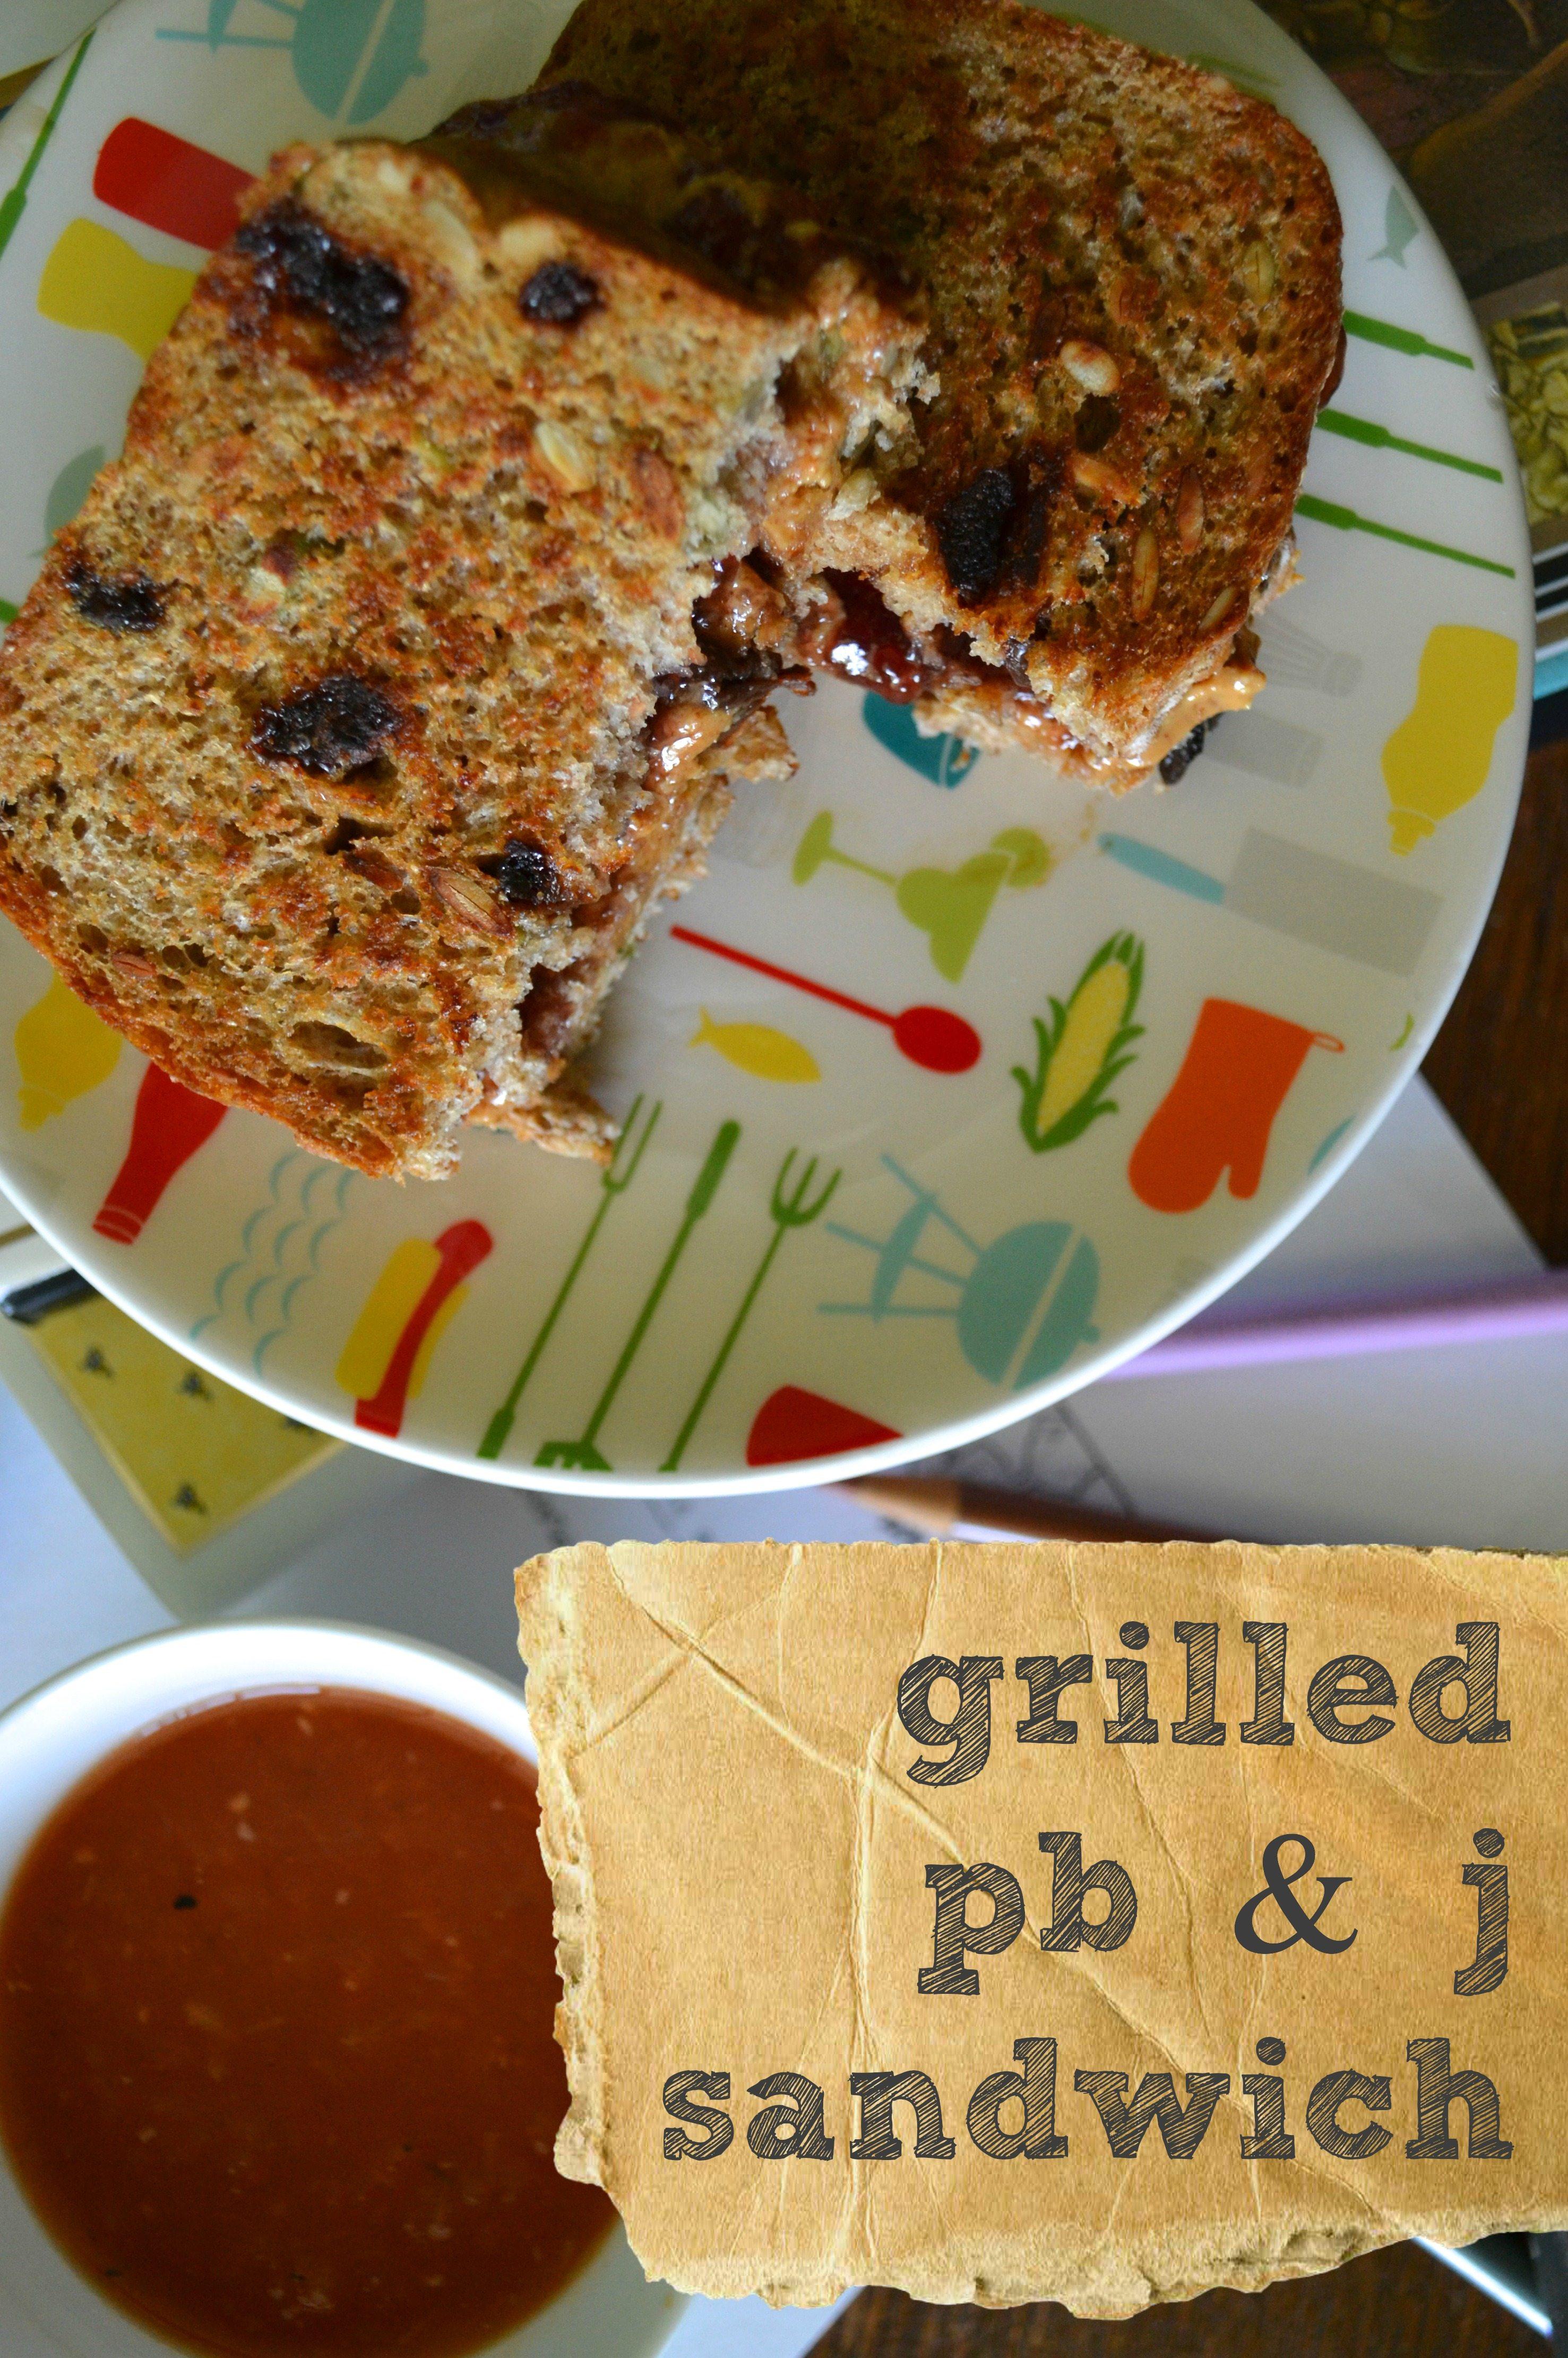 grilled pb & j